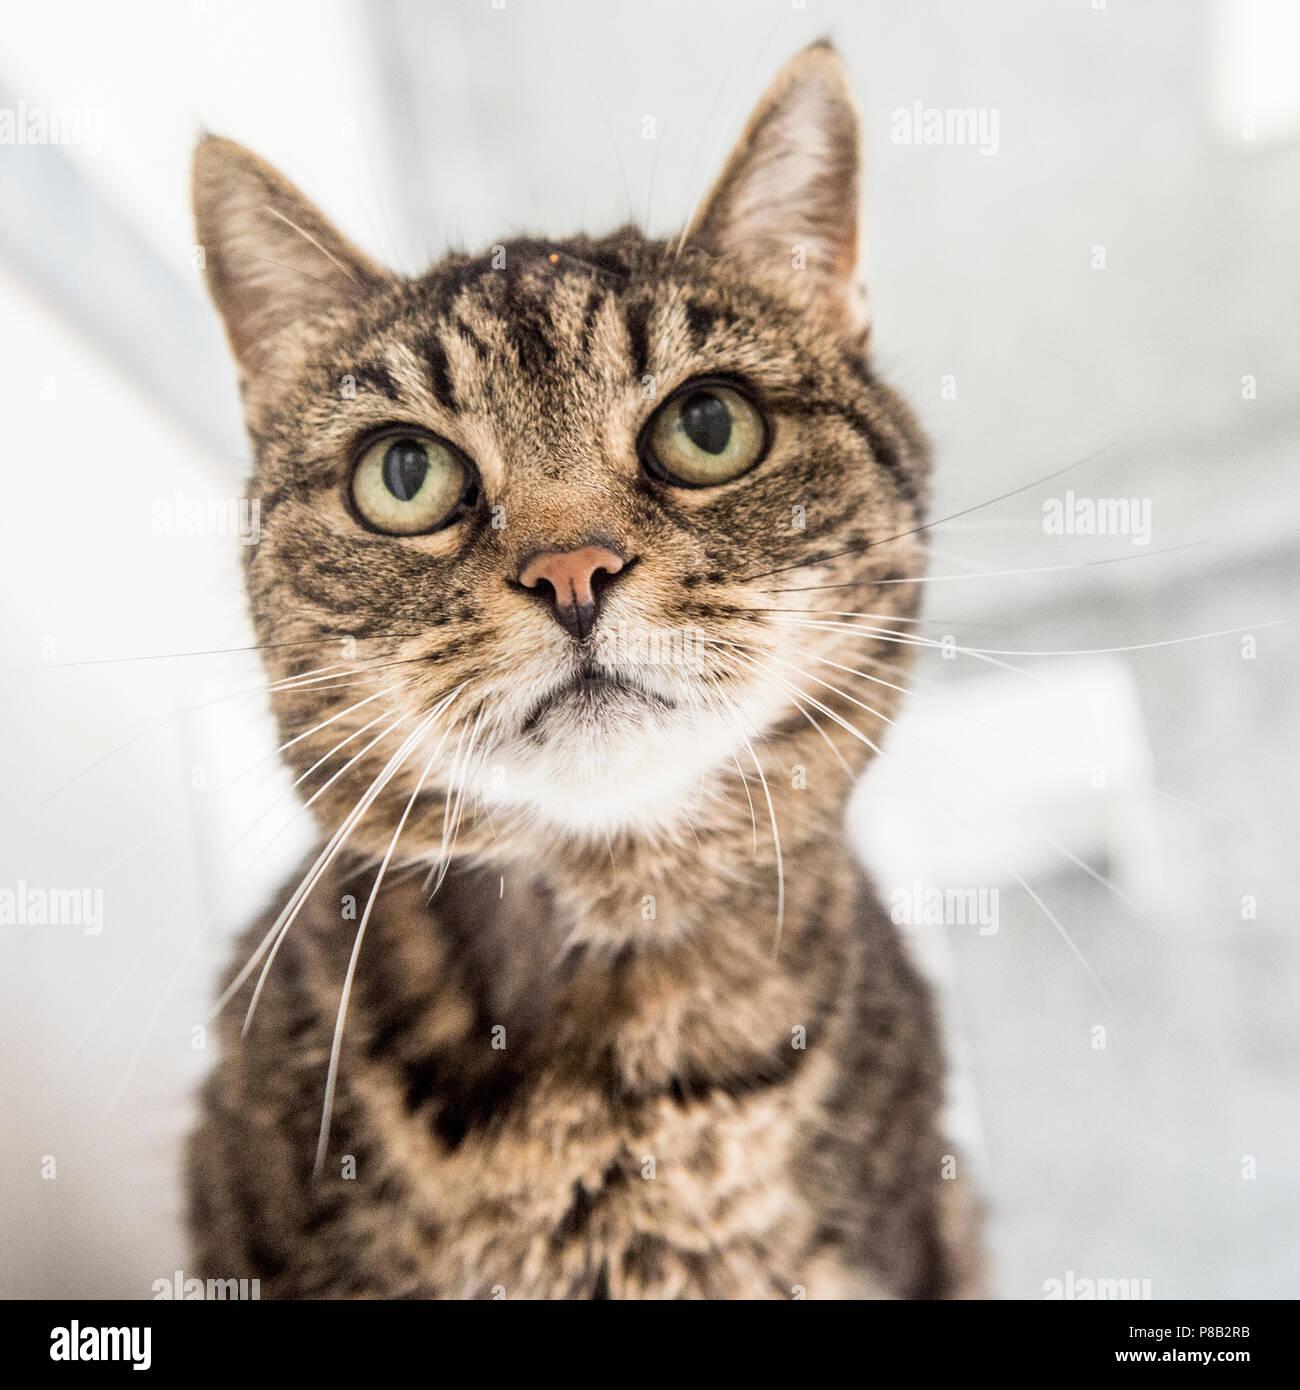 tabby cat - Stock Image